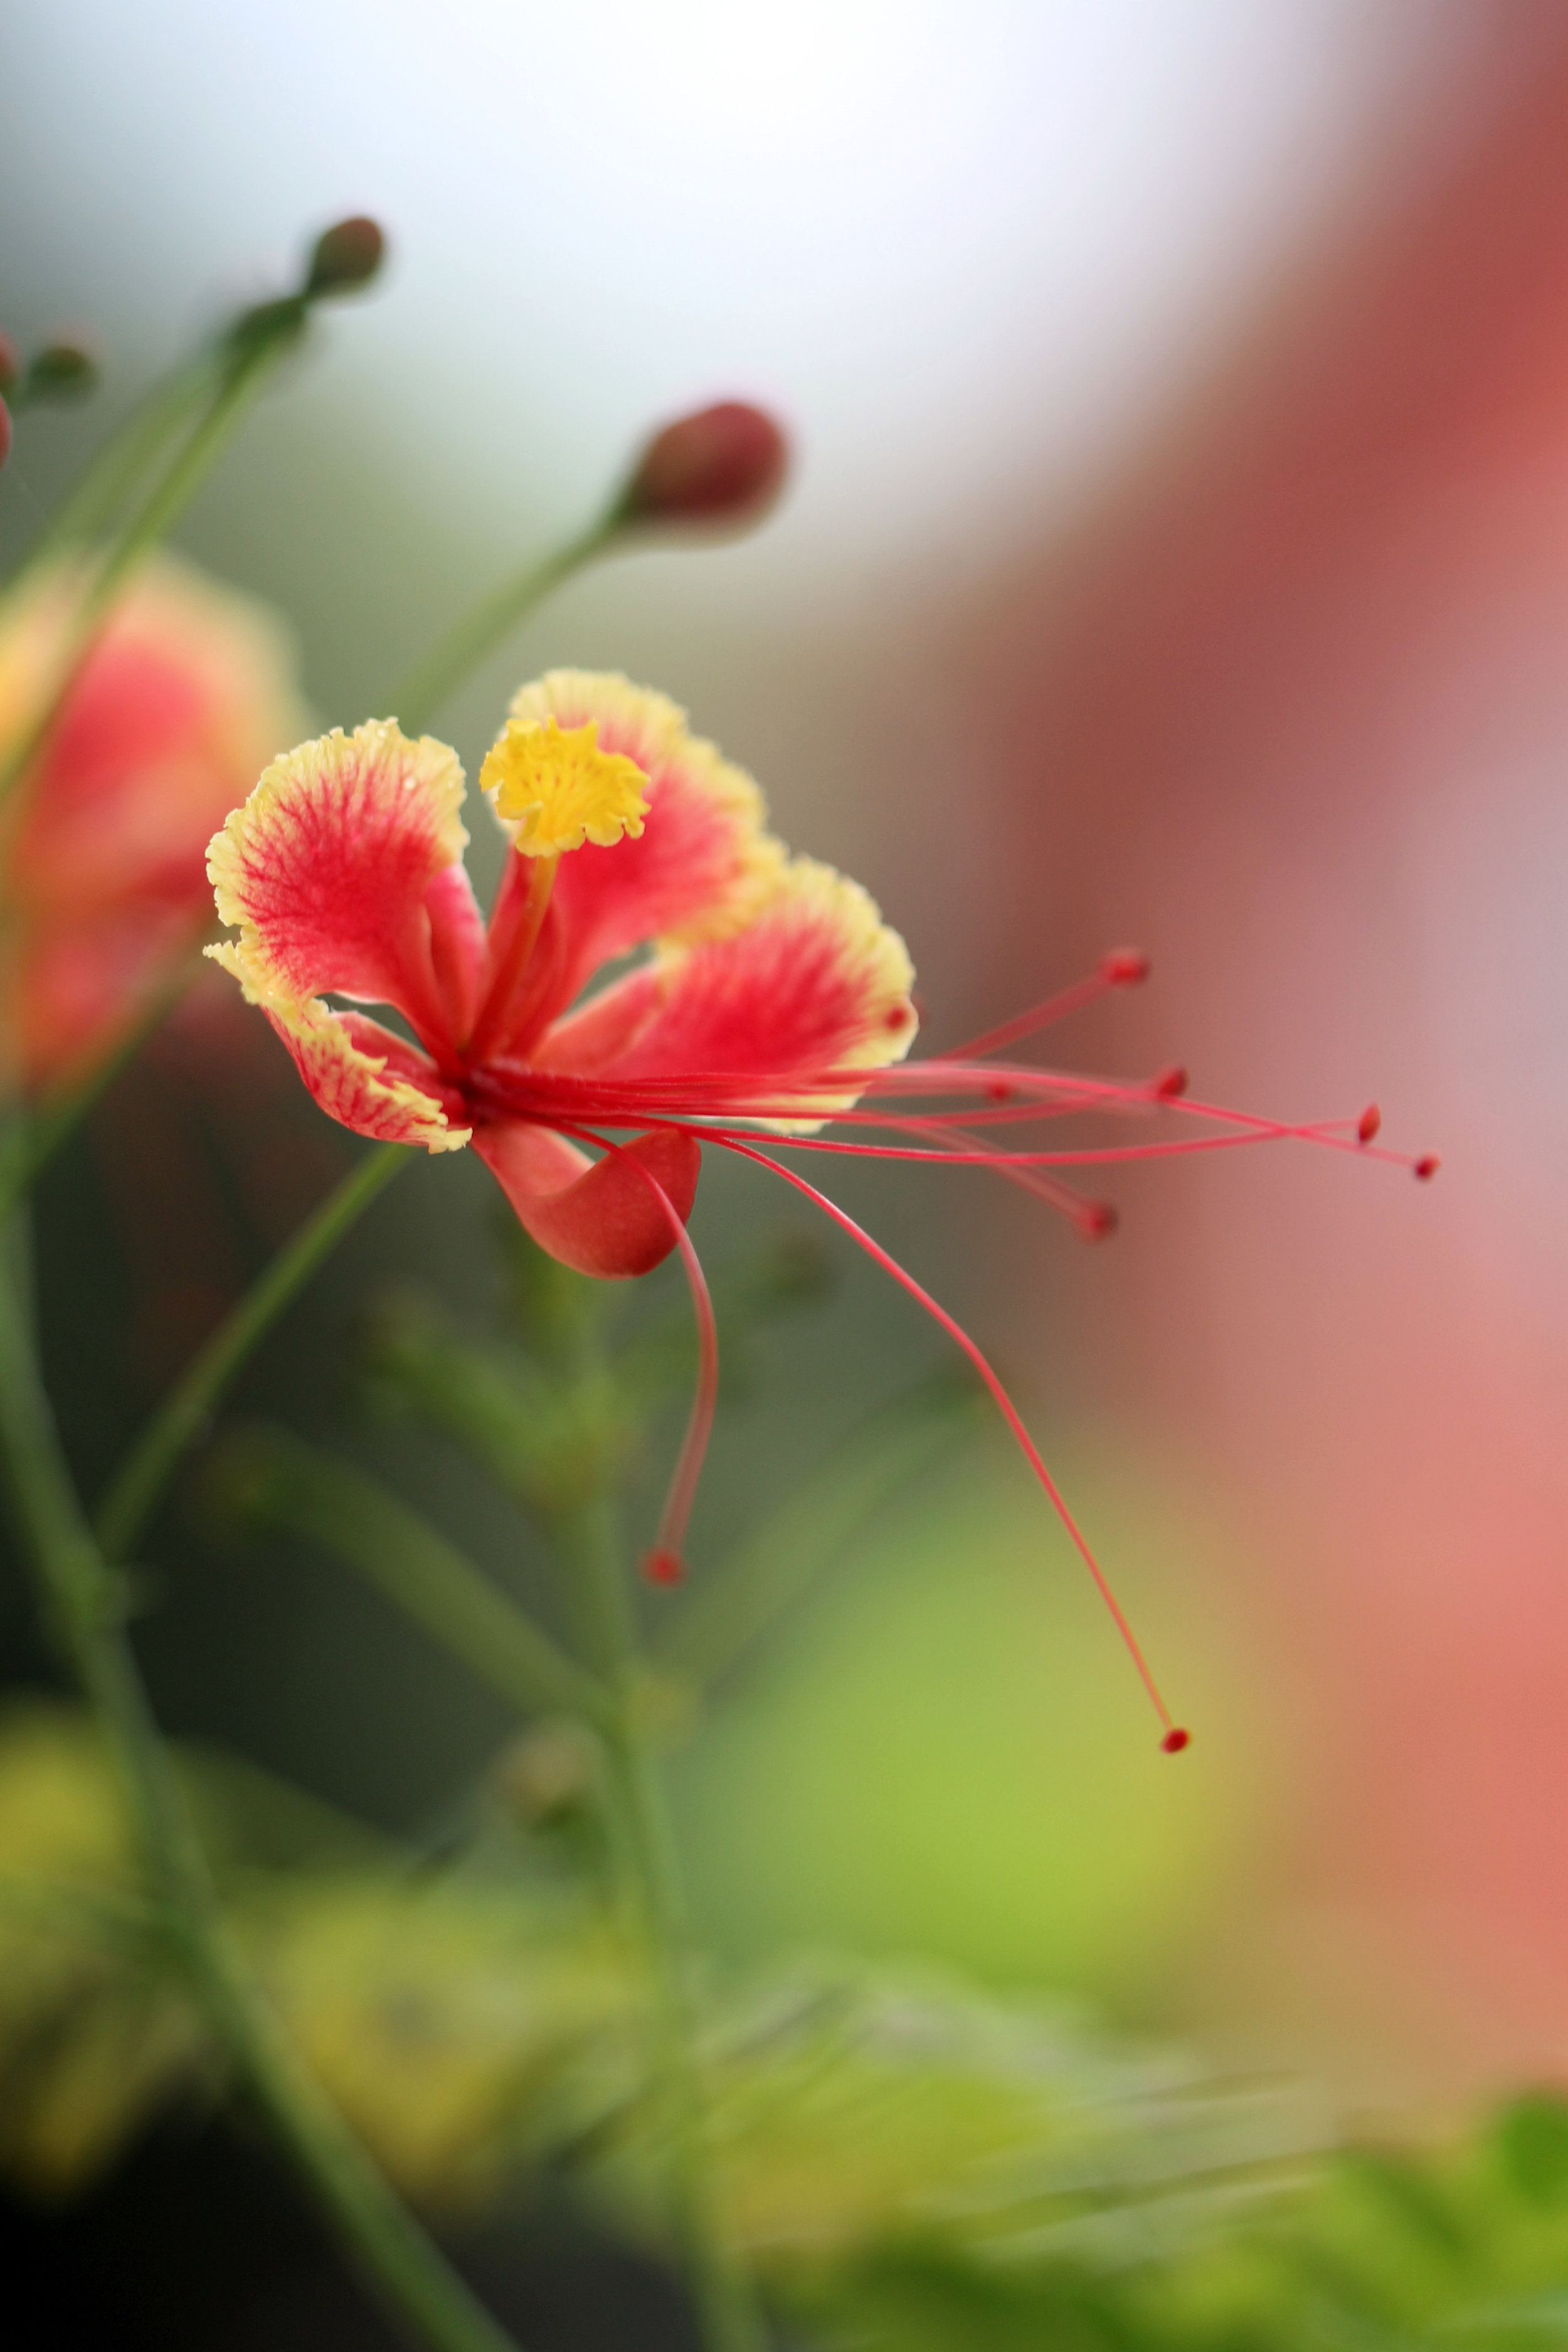 aaa_new flower.jpg